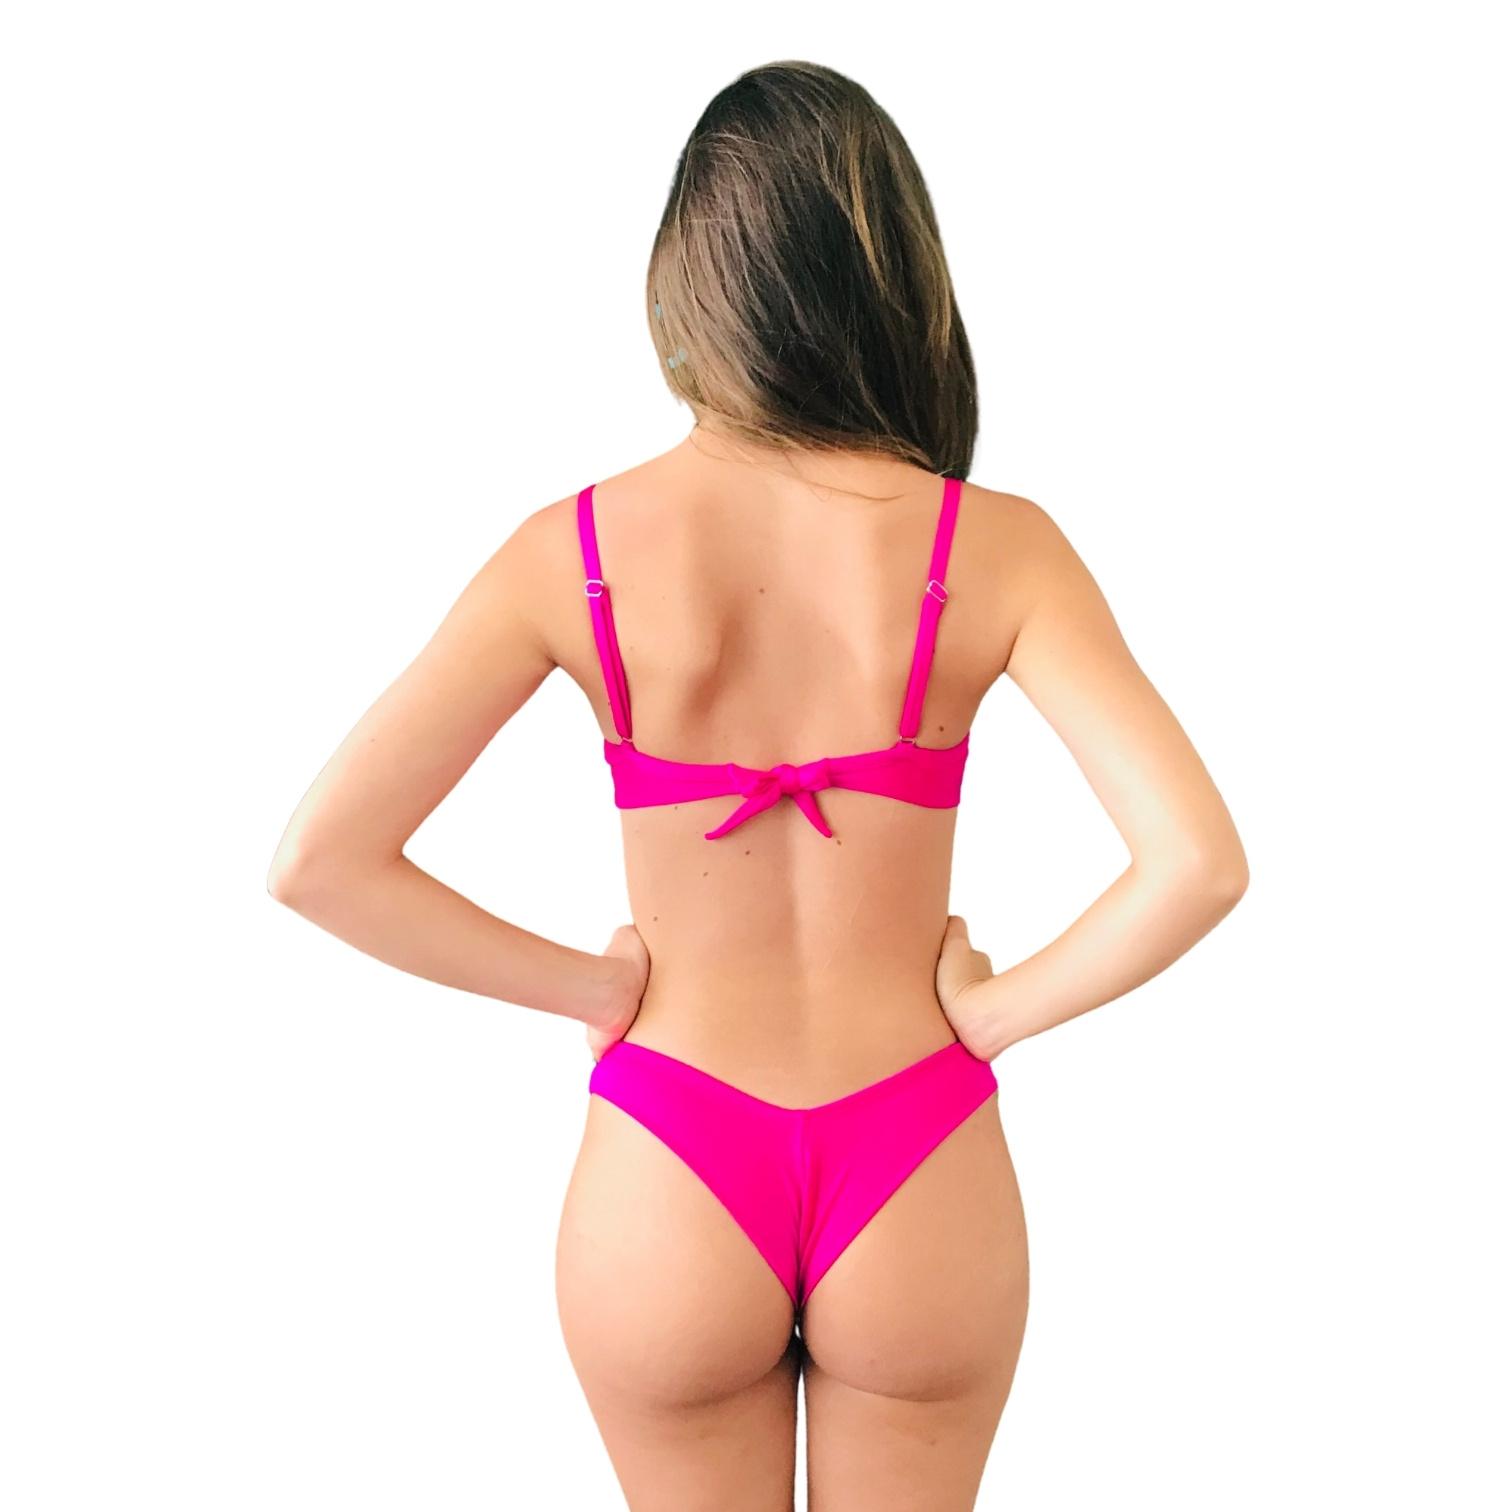 Biquíni Meia Taça Retrô Com Tanga Asa Delta Fio Duplo Pink Cirrê